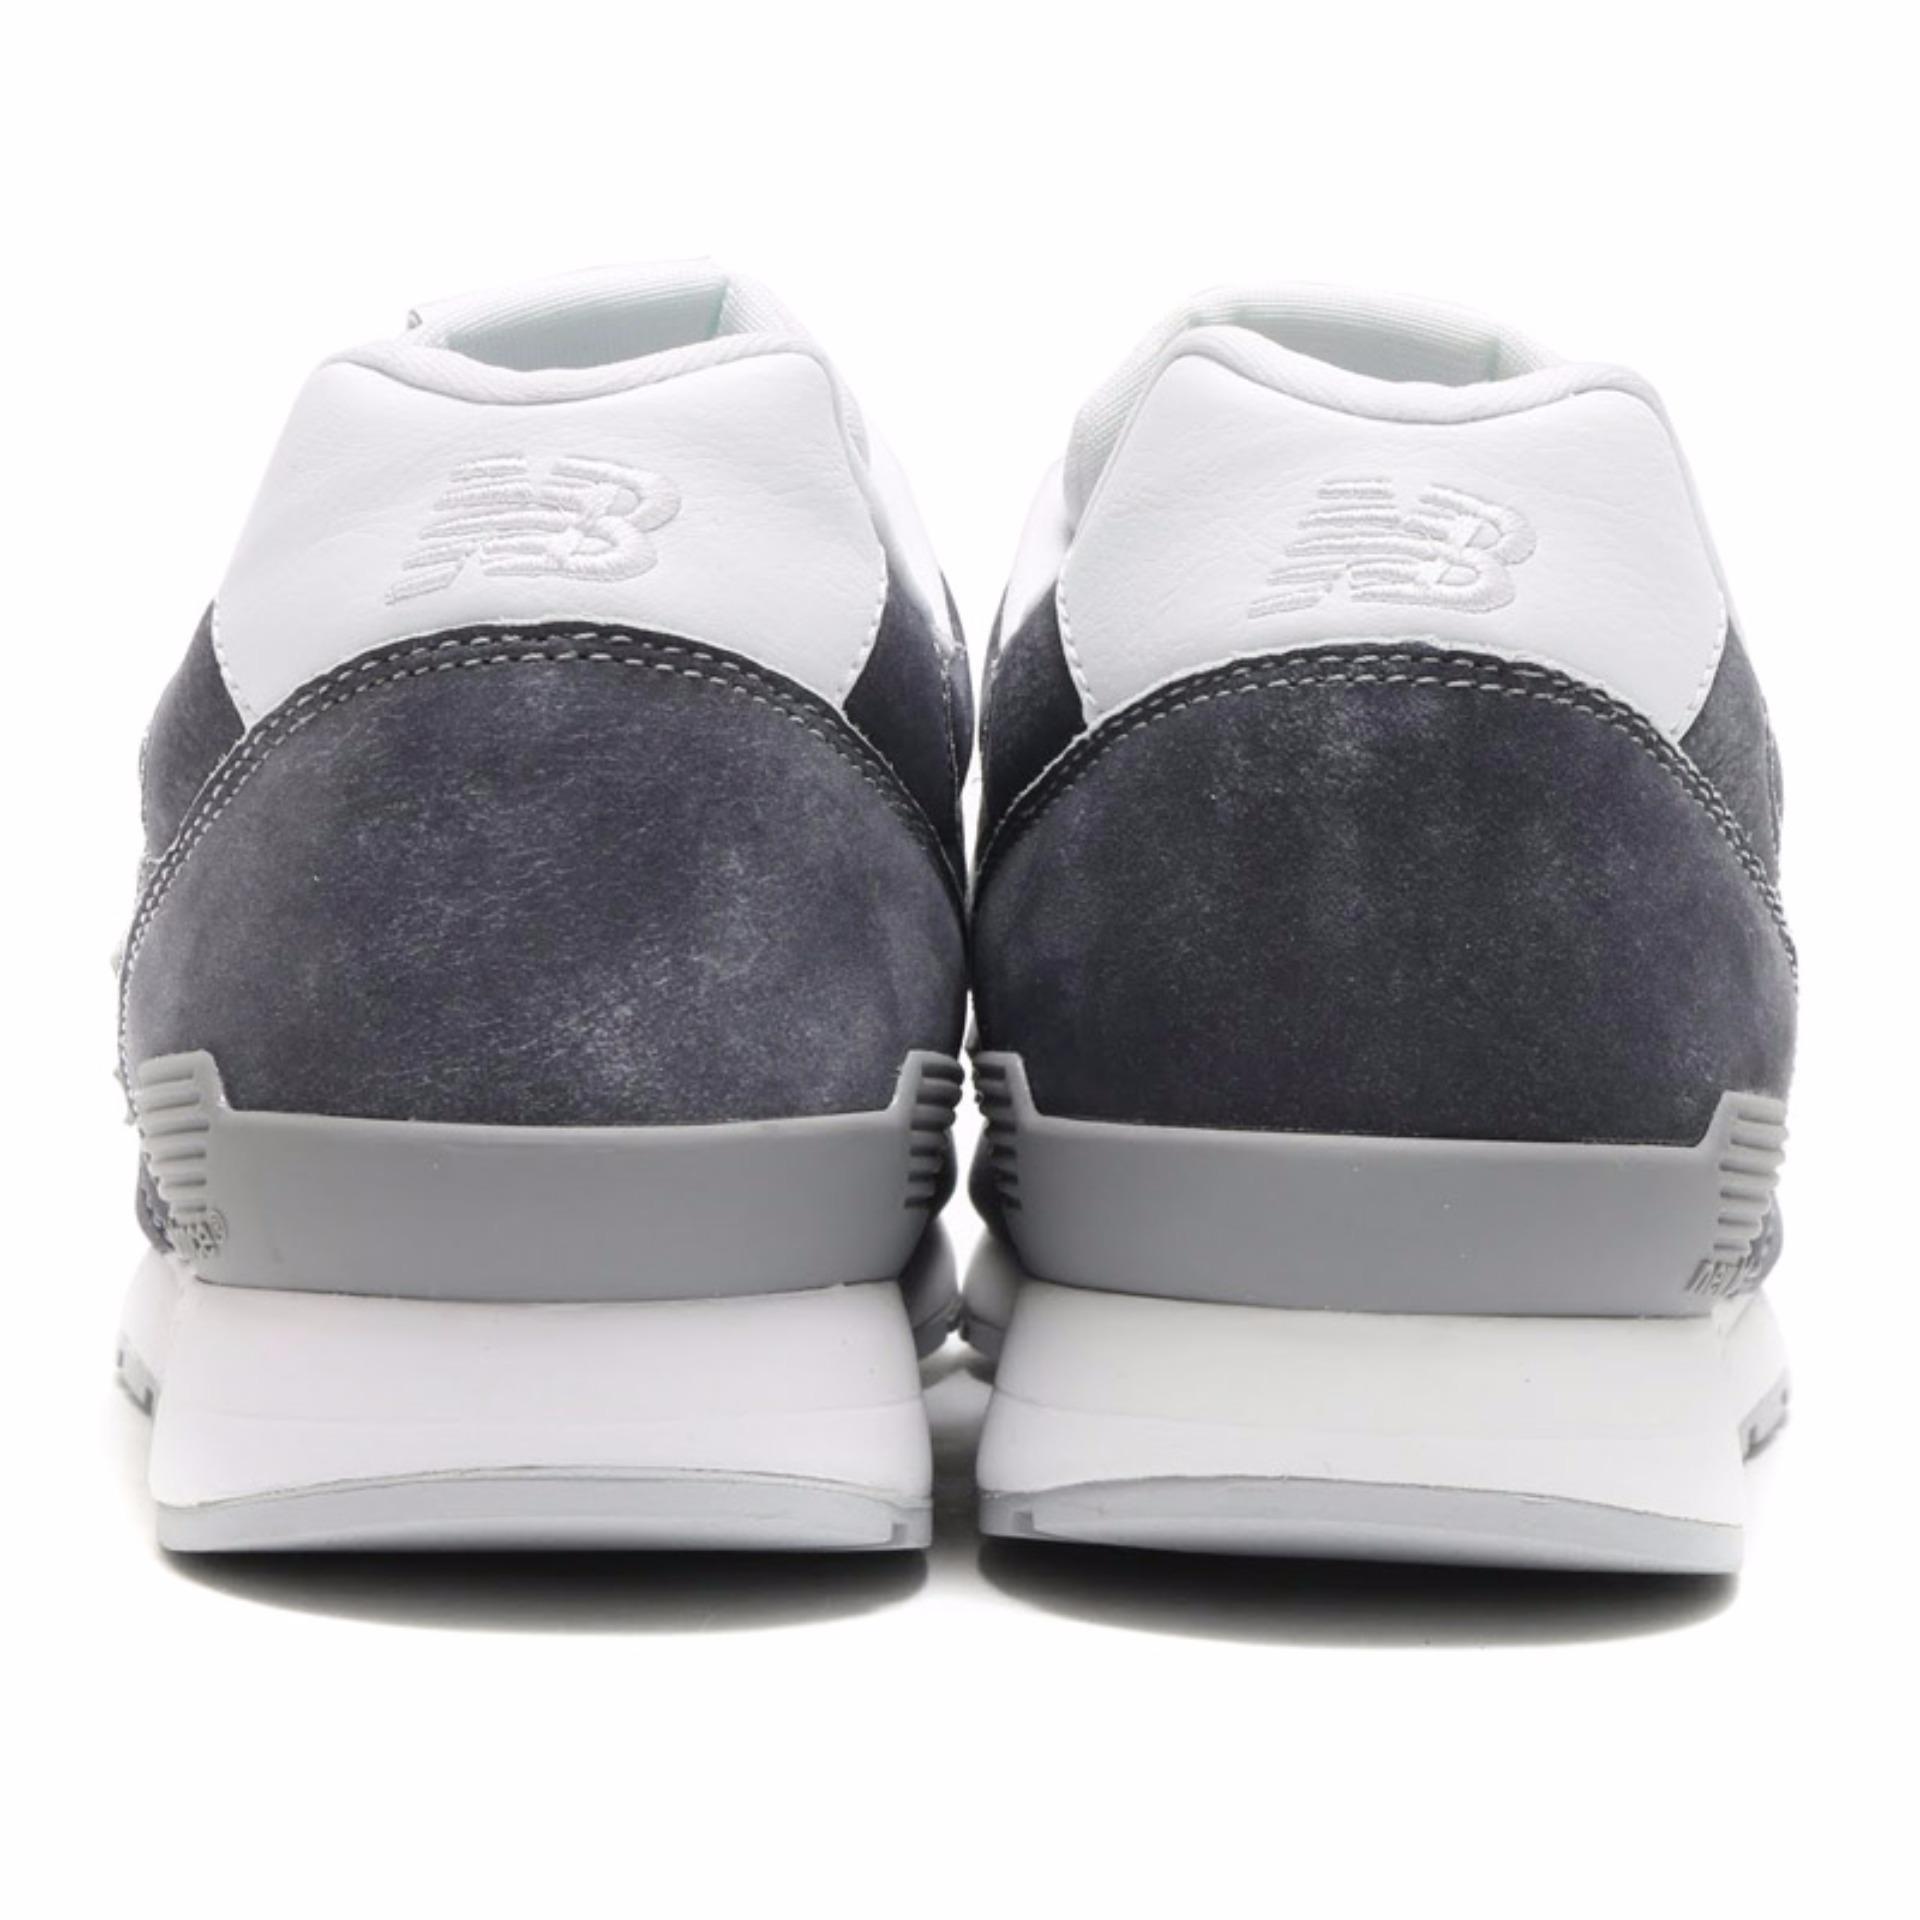 Eshop Checker New Balance Revlite 996 Grey Nubuck Mrl996ju Harga Saya 565 Sneakers Pria Hitam